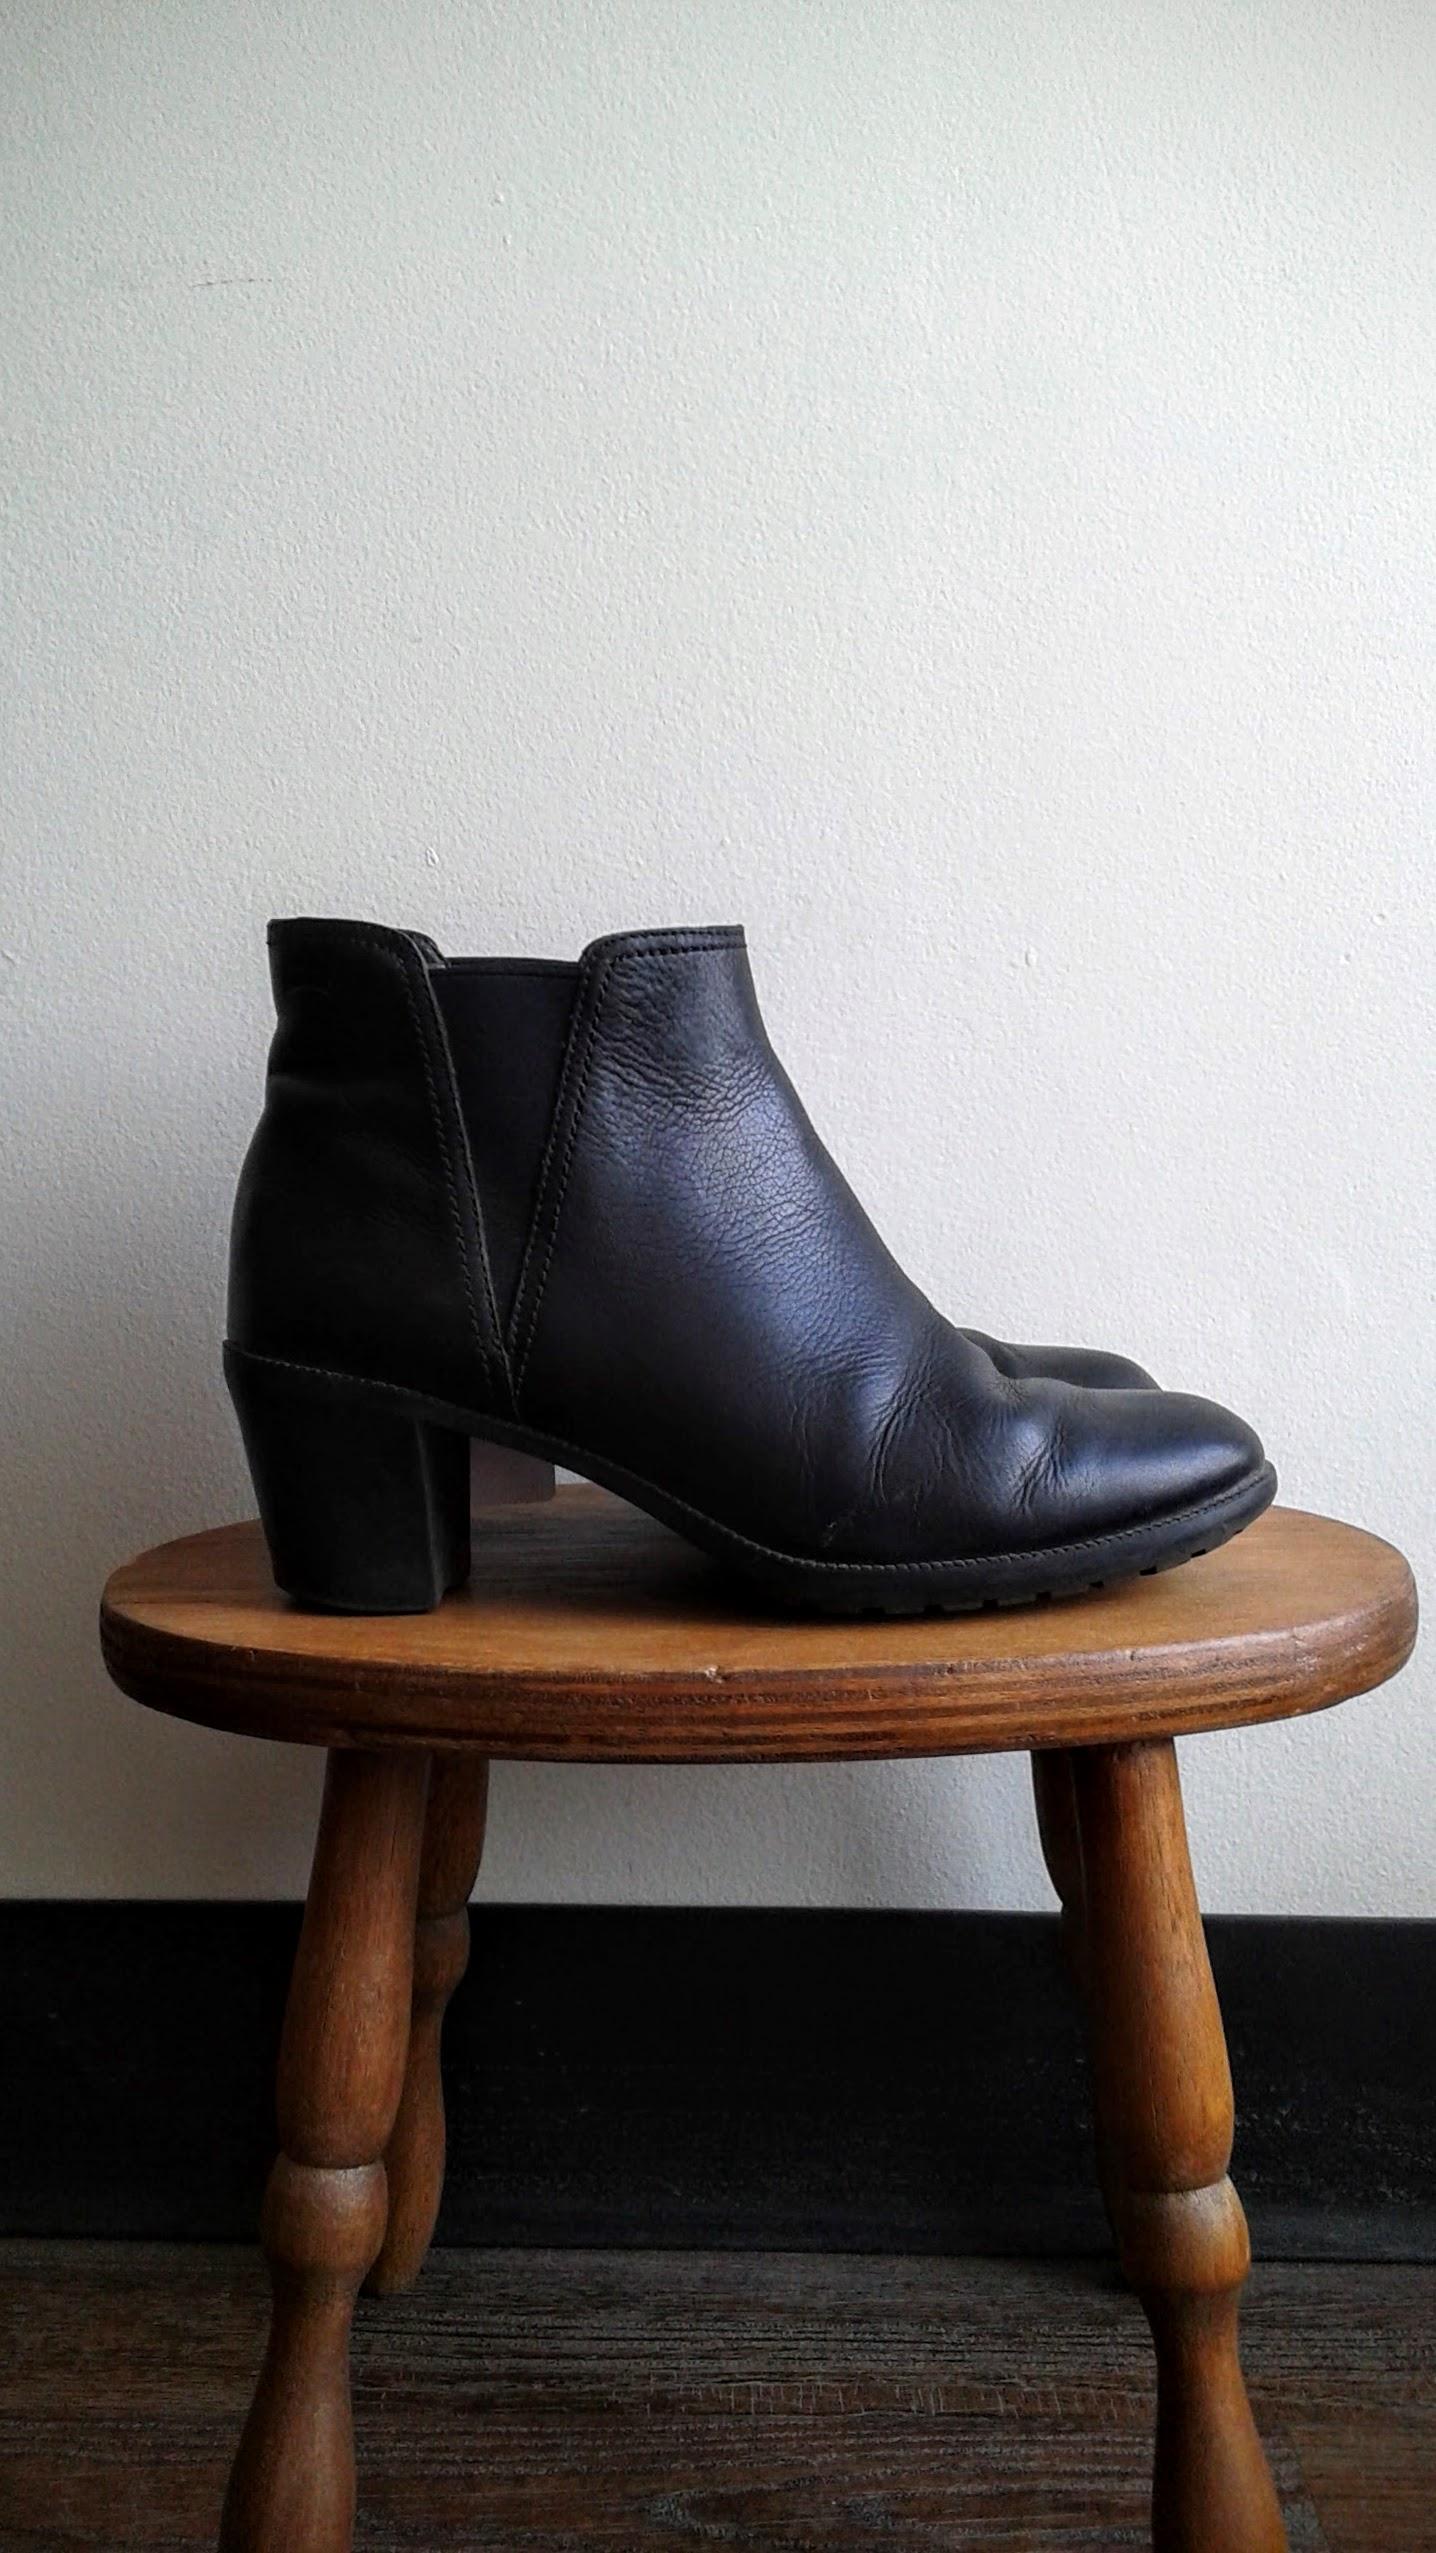 Camper boots; S8, $65